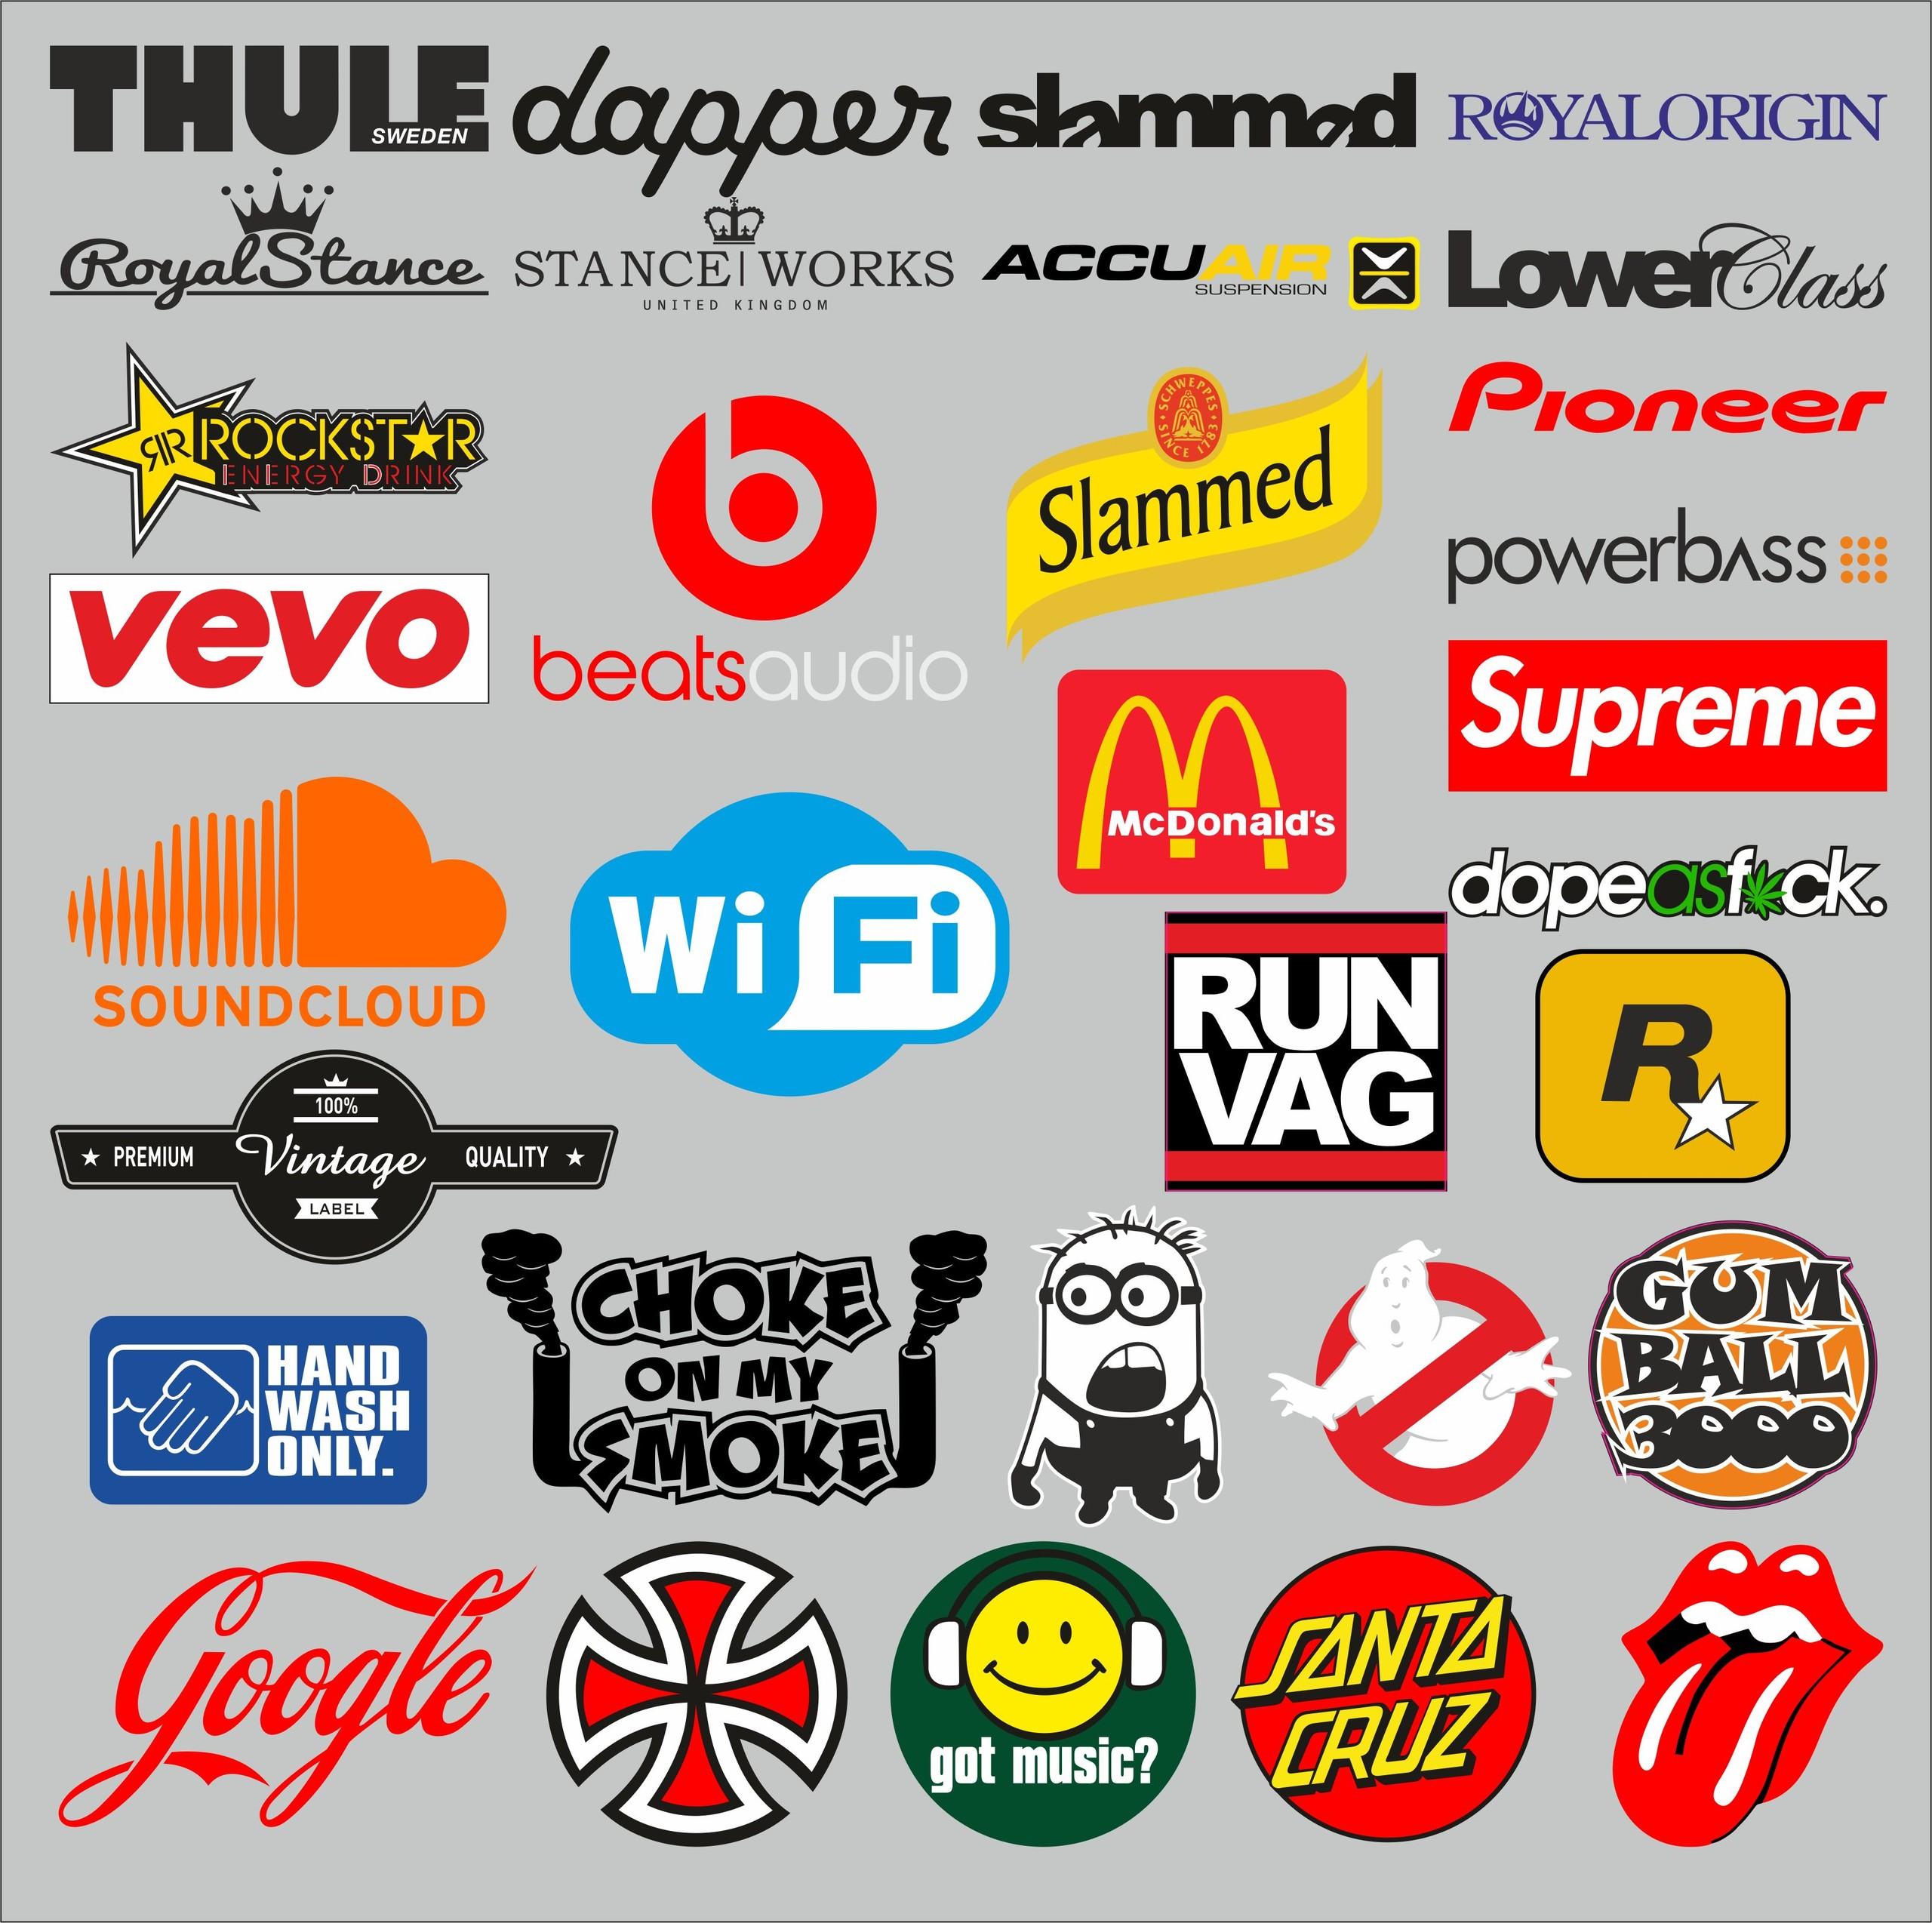 thule dapper slammed royal stance suprame google cocacola santa cruz got music elit sticker etiket